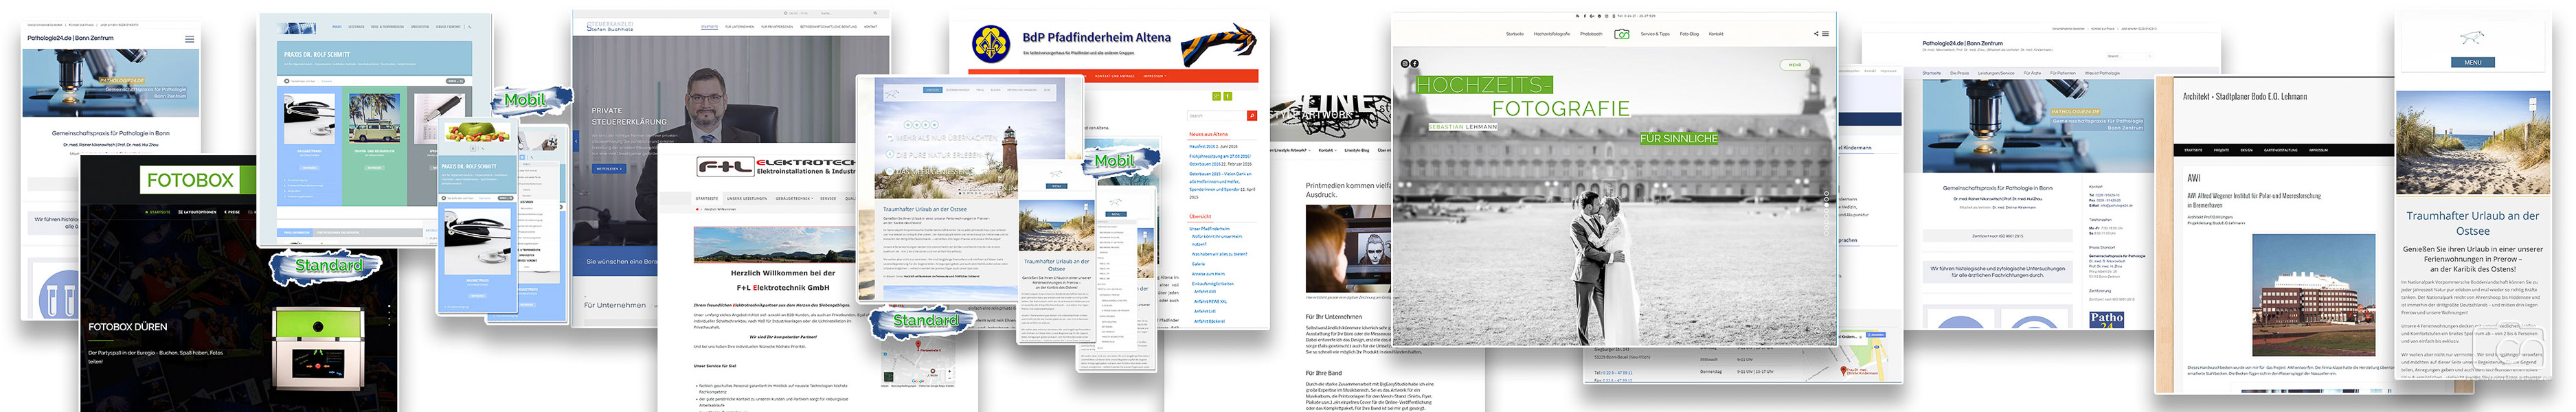 Webdesigner aus Düren - Sebastian Lehmann - Banner